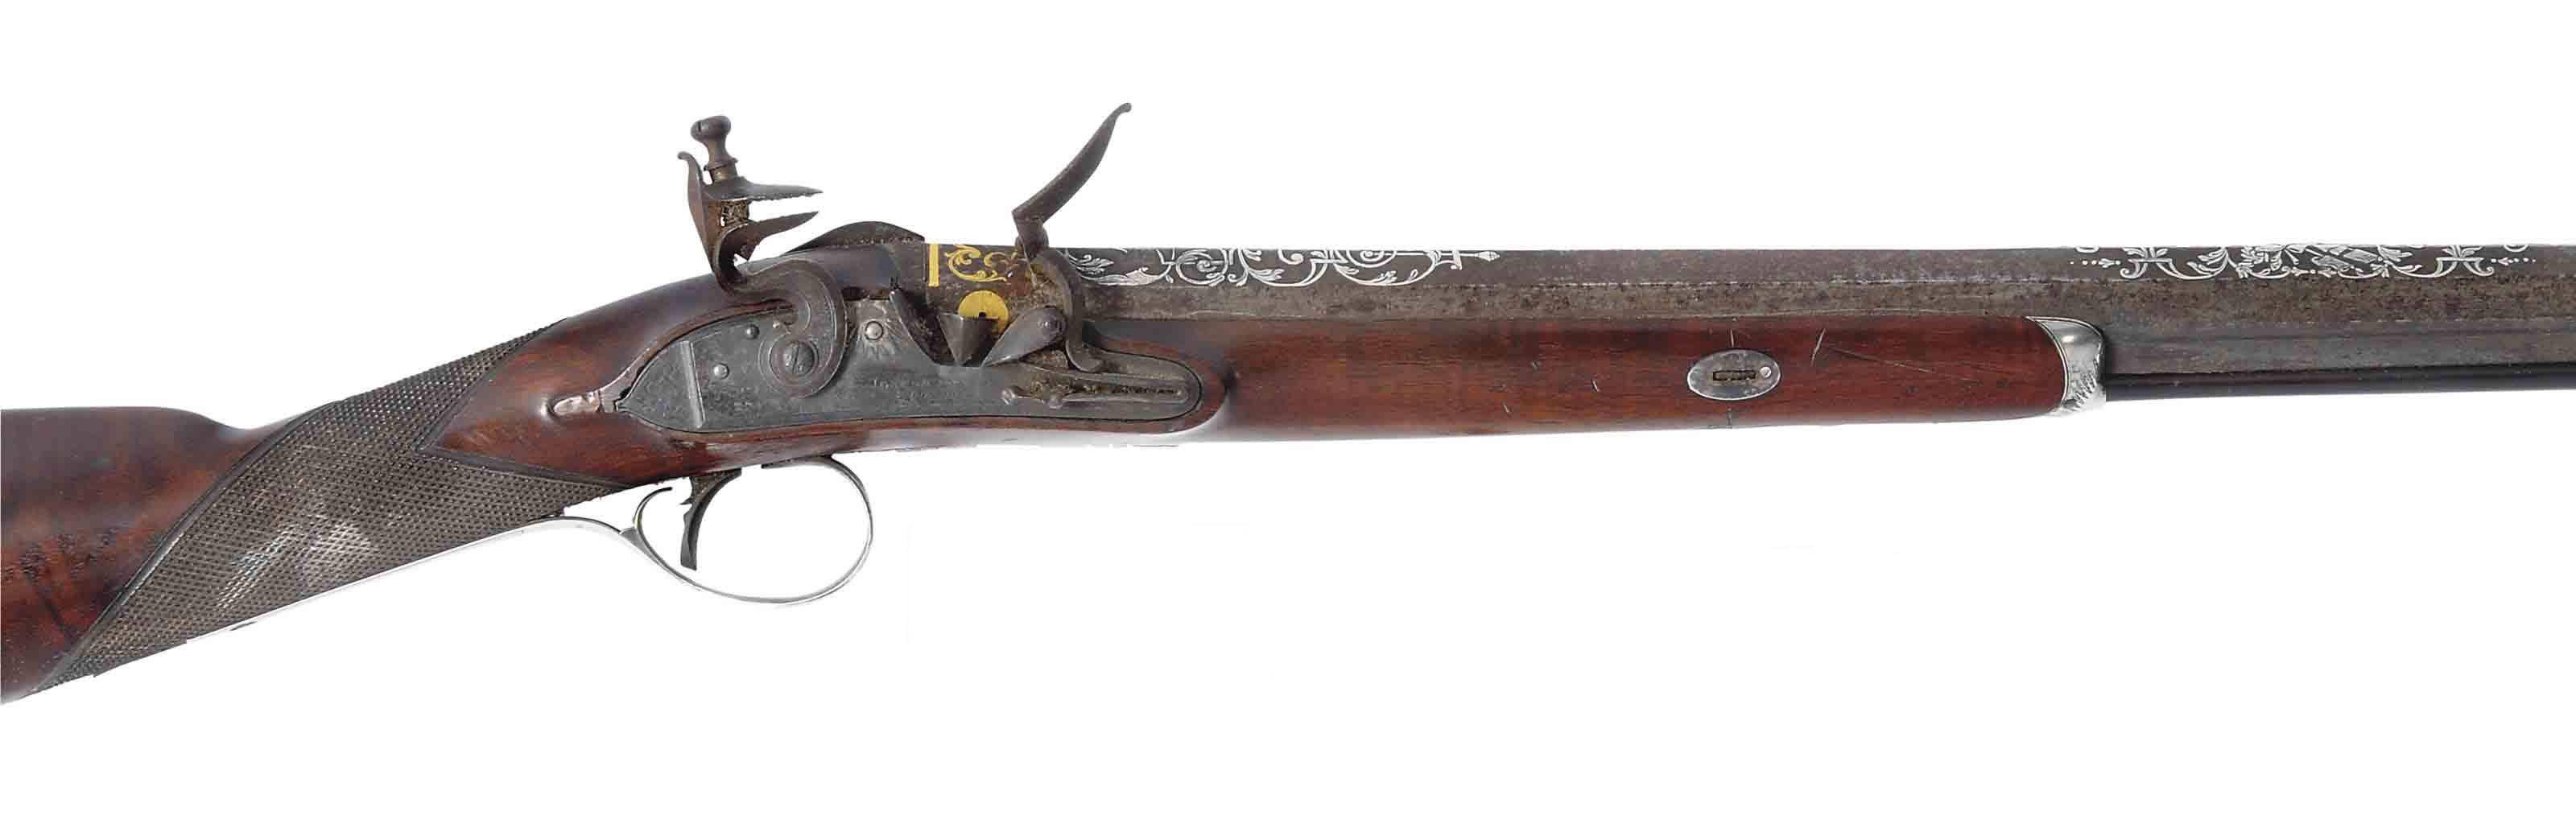 AN 18-BORE SILVER-MOUNTED SINGLE-BARRELLED FLINTLOCK SPORTING GUN